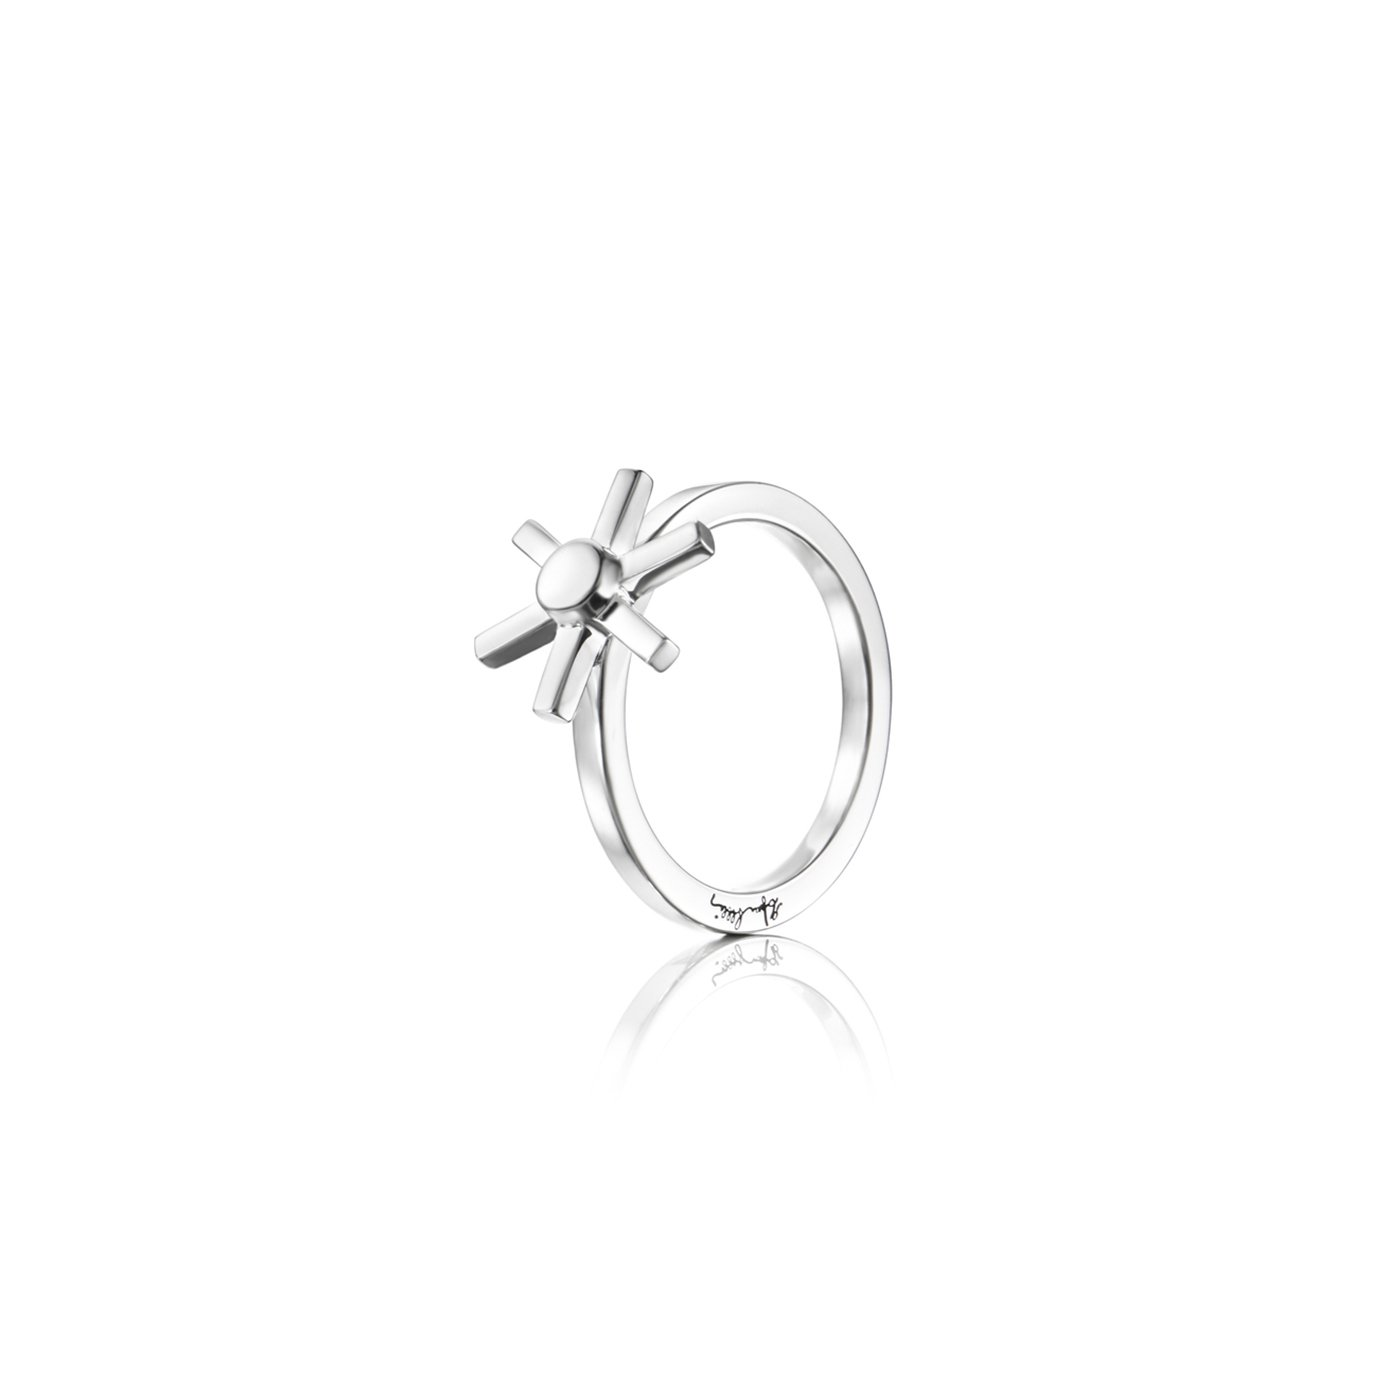 : - Starflower ring